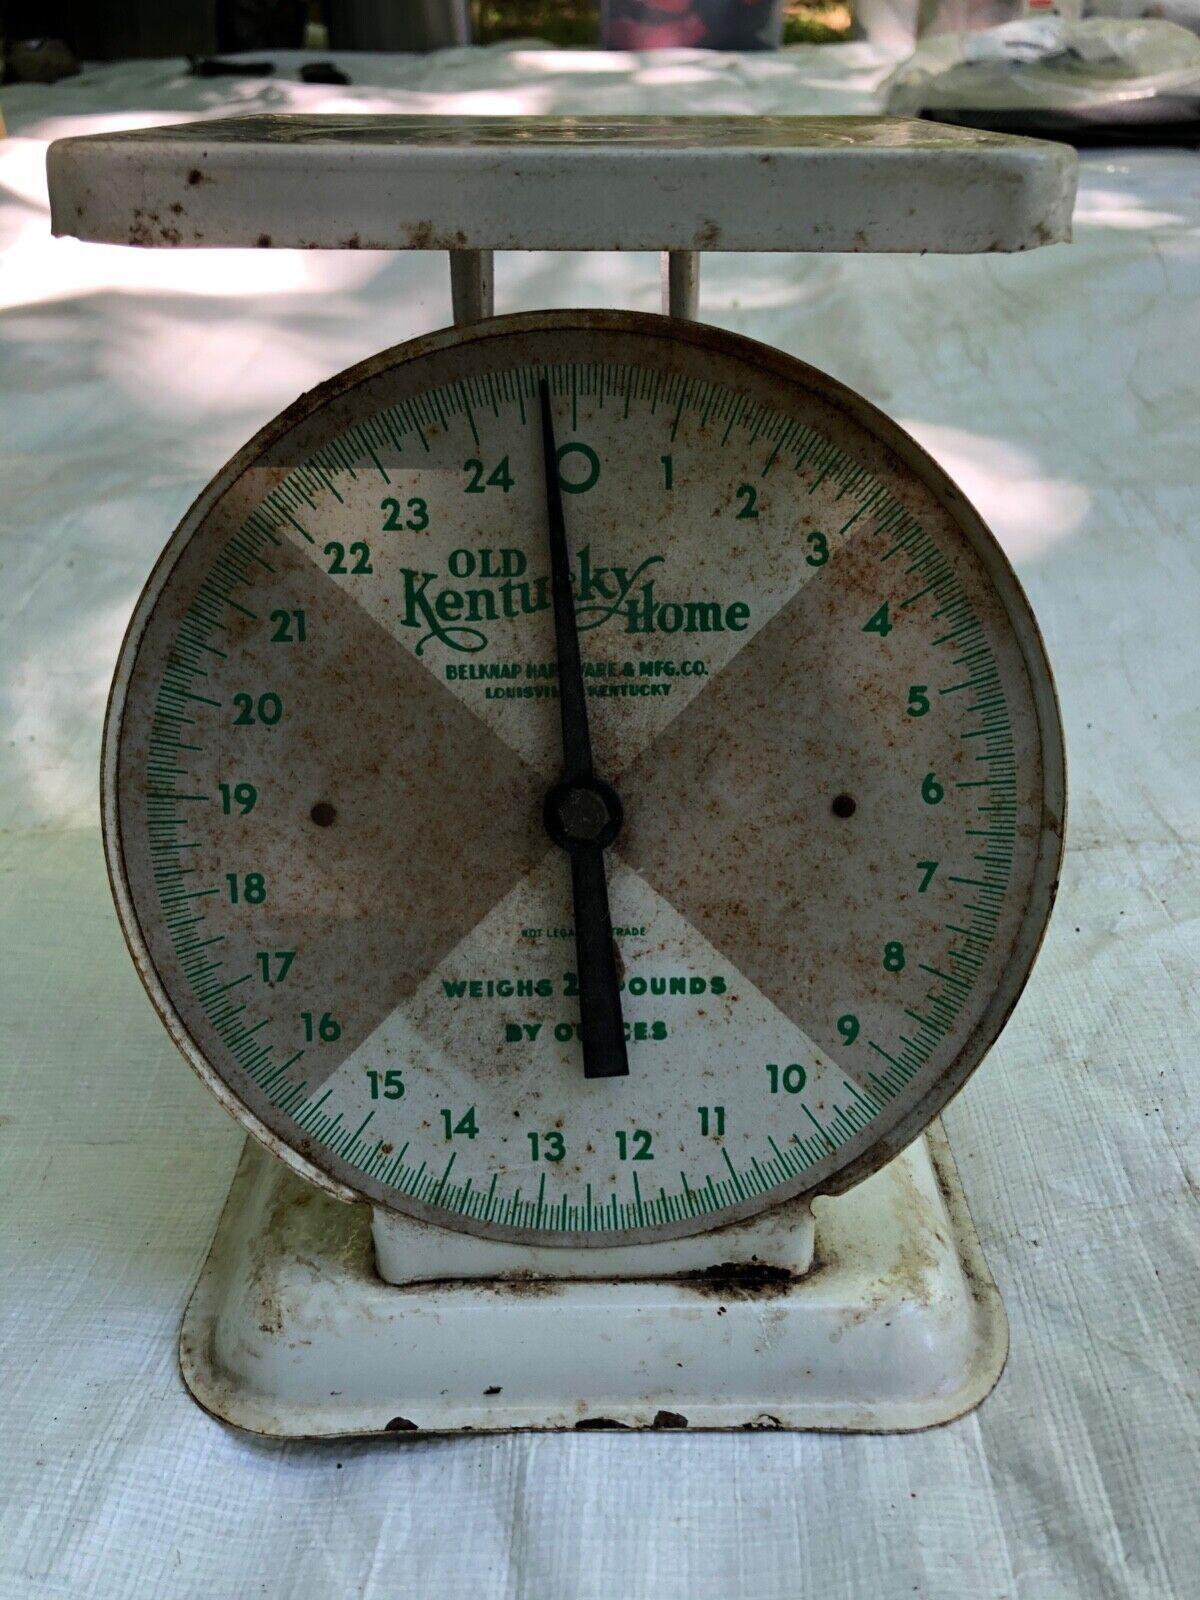 Old Kentucky Home Vintage Kitchen Scale Belknap Hardware Mfg. Co. - $45.00